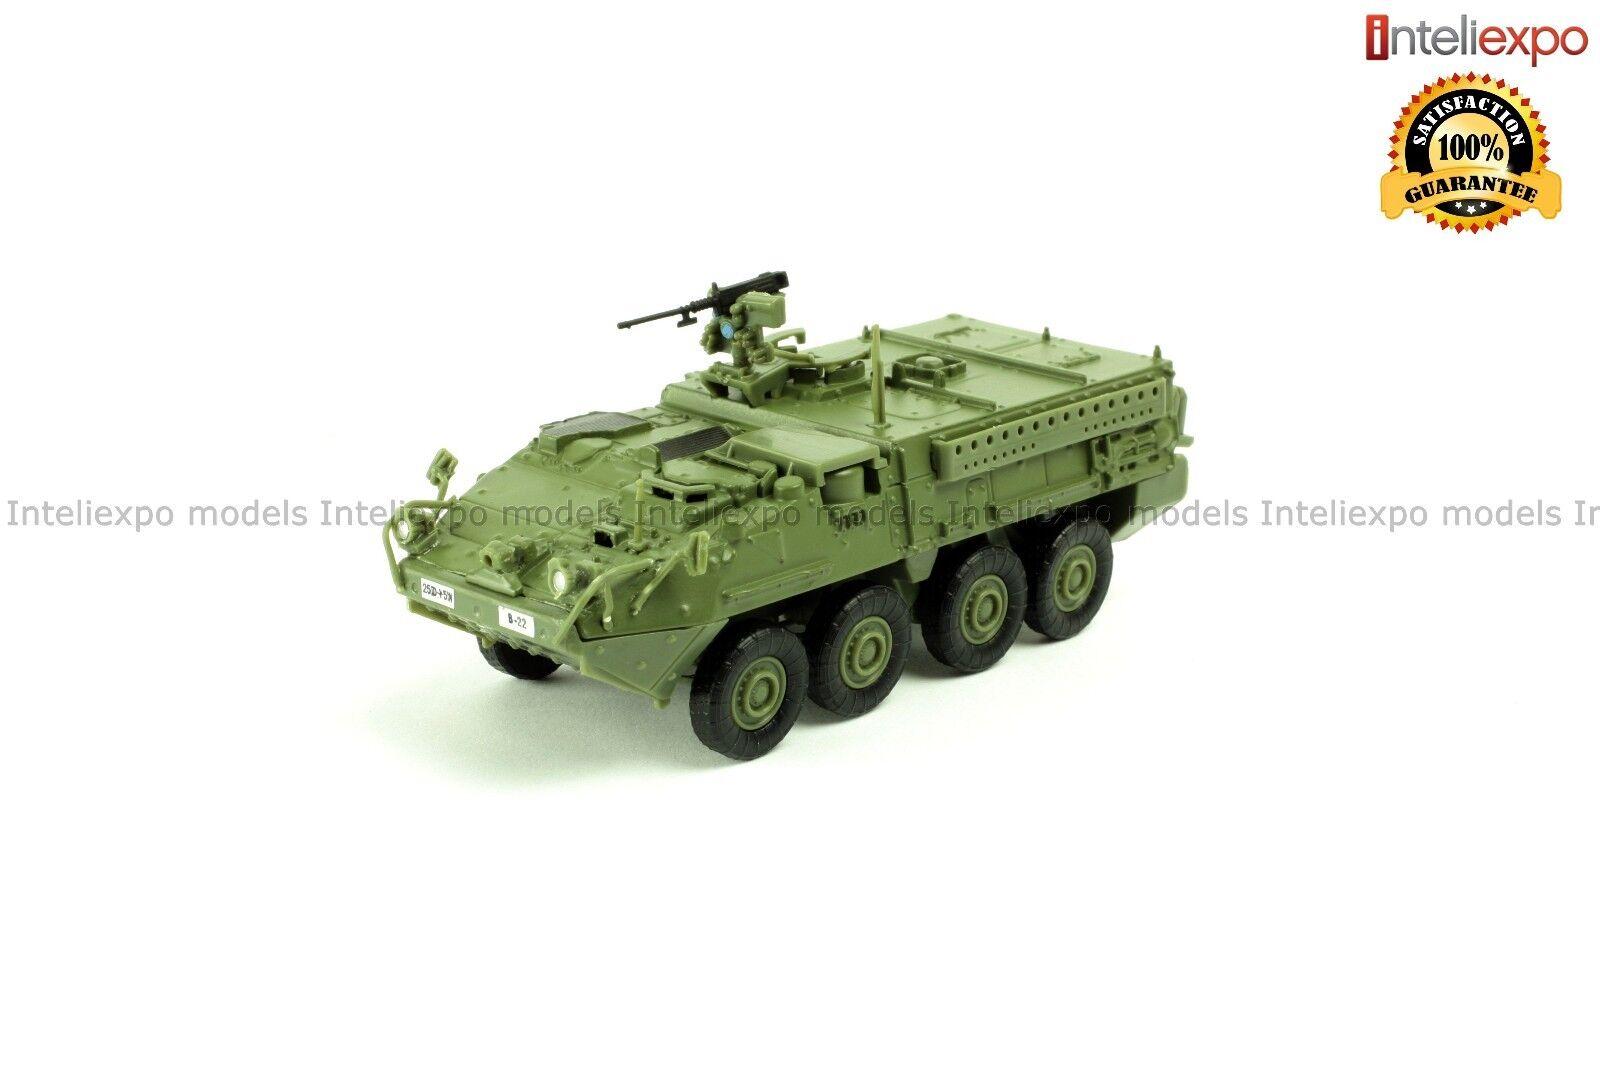 M1126 Stryker ICV 2003 US Army Vehicle Model 1 72 Military Iraq War New No 14